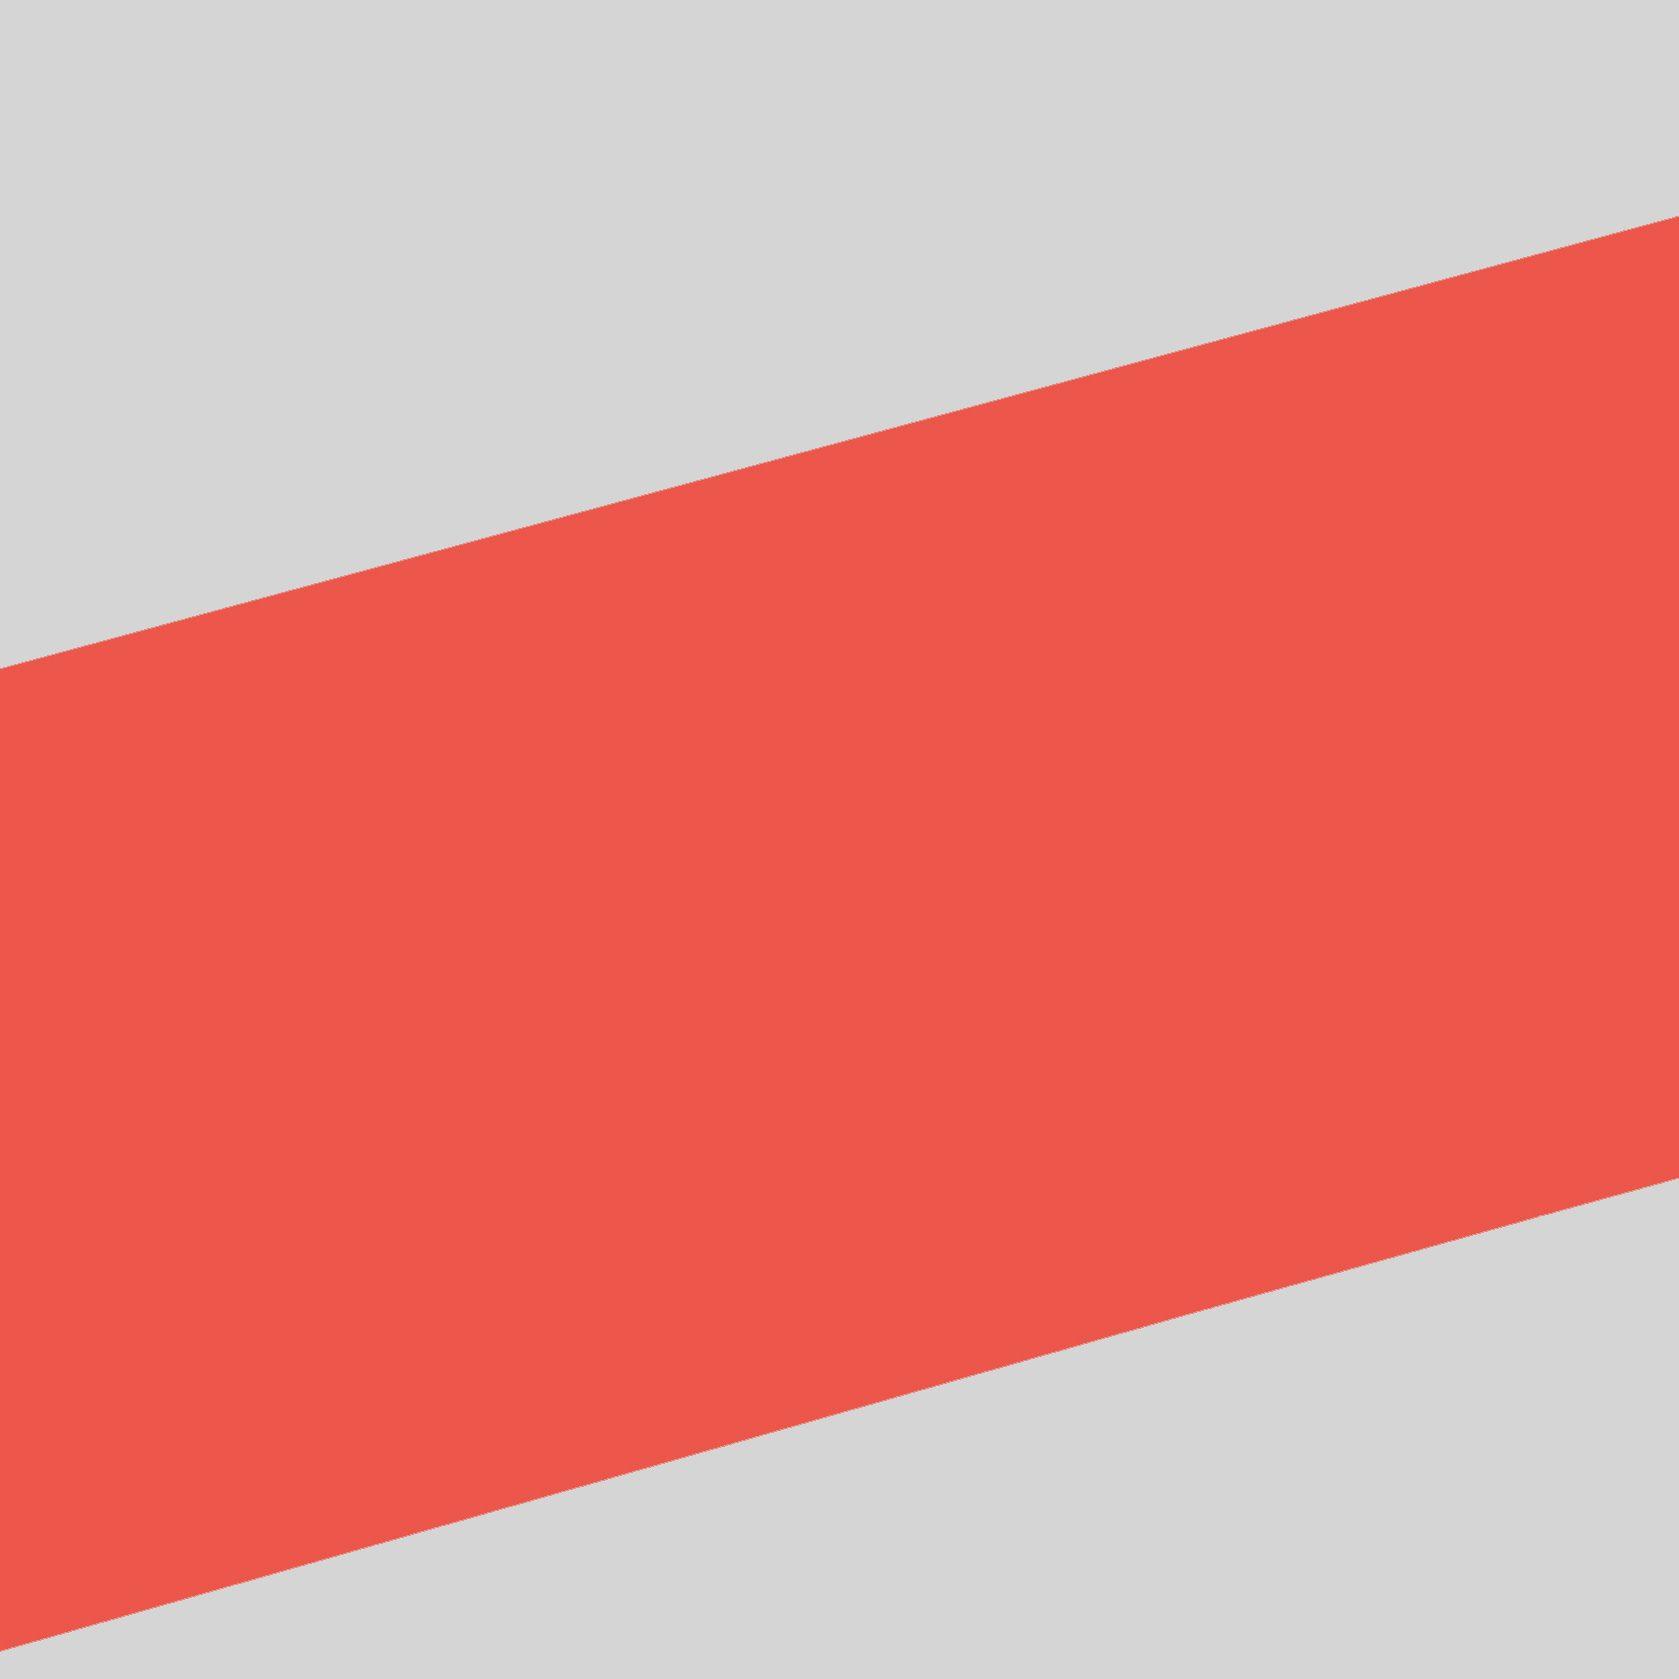 Fond-rideau-orange-final